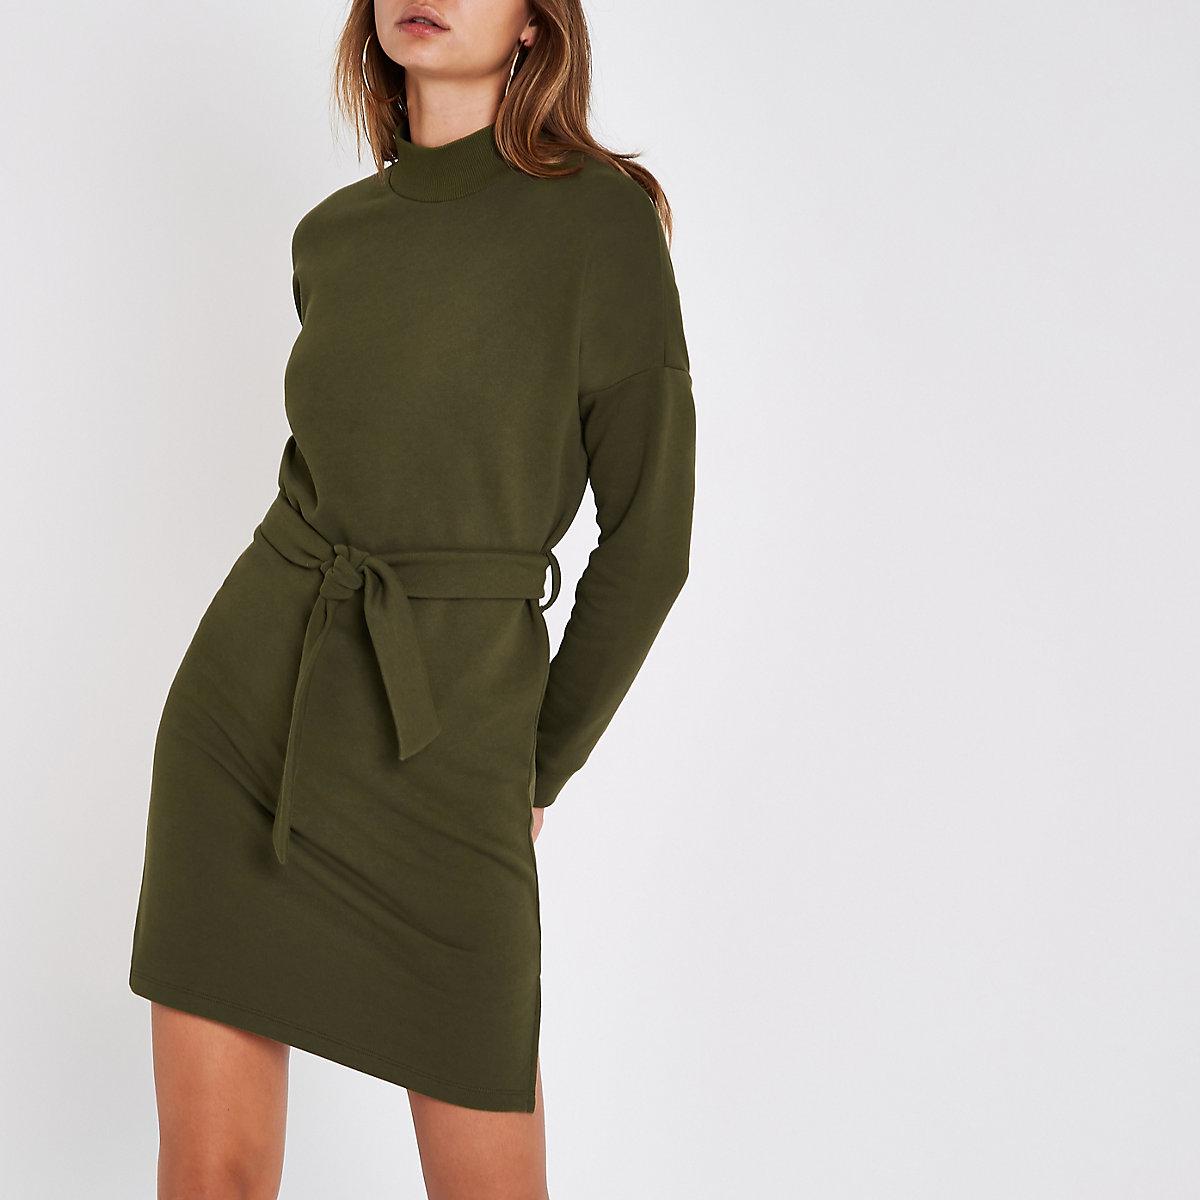 Khaki high neck belted sweater dress